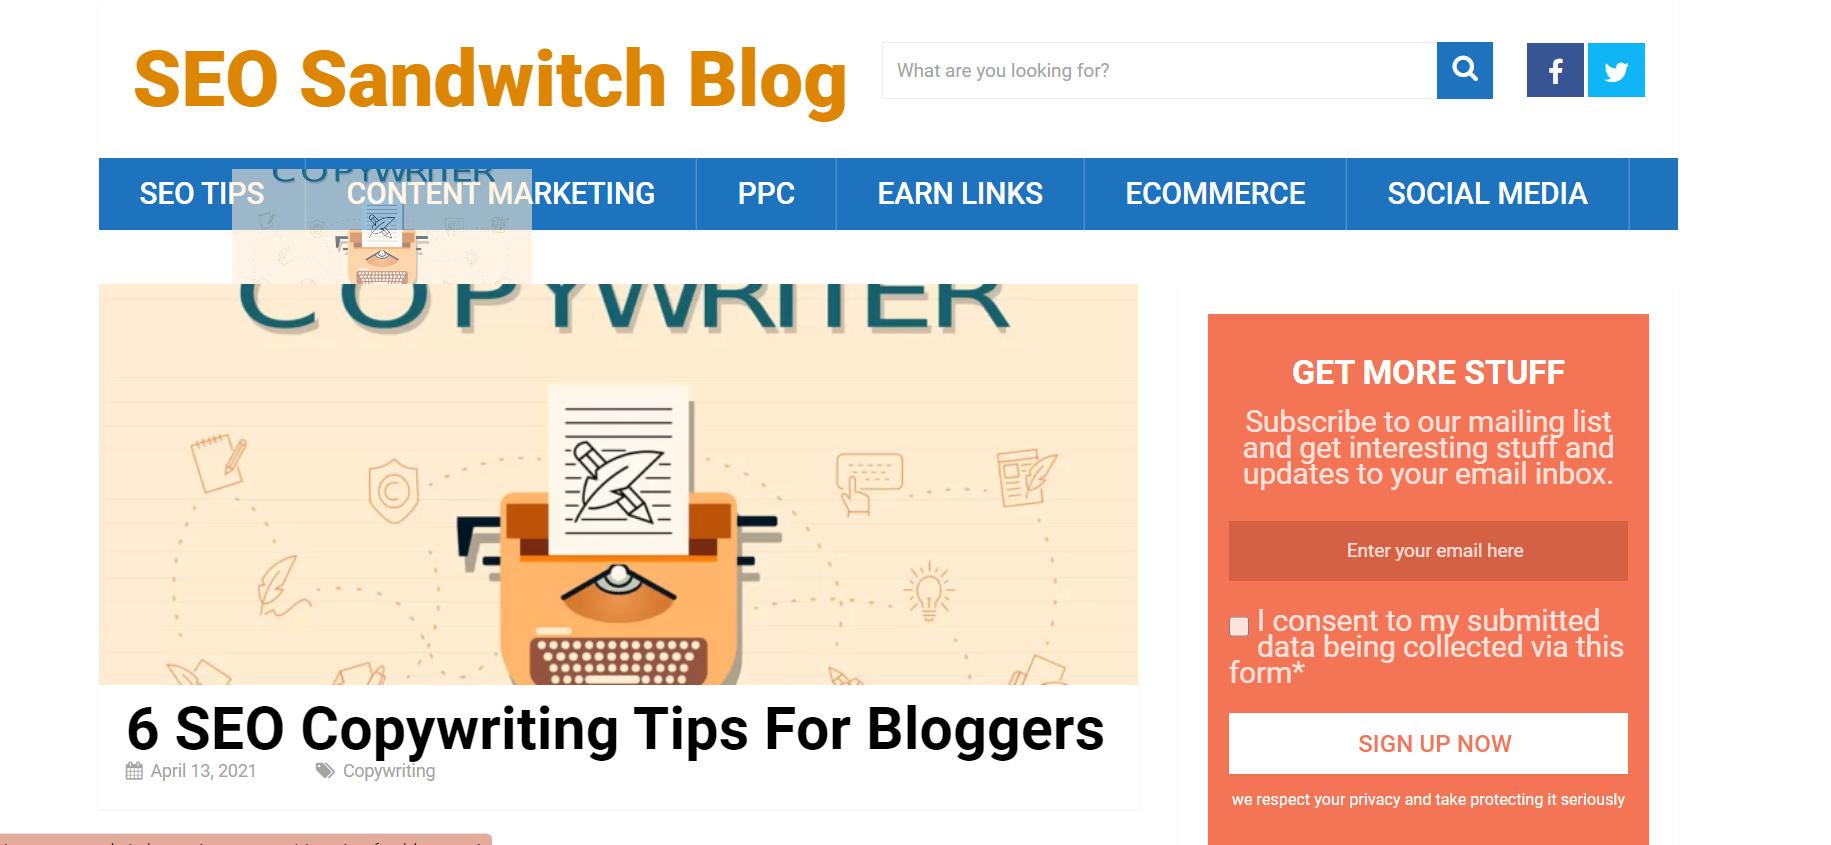 Seo Sandwitch Blog